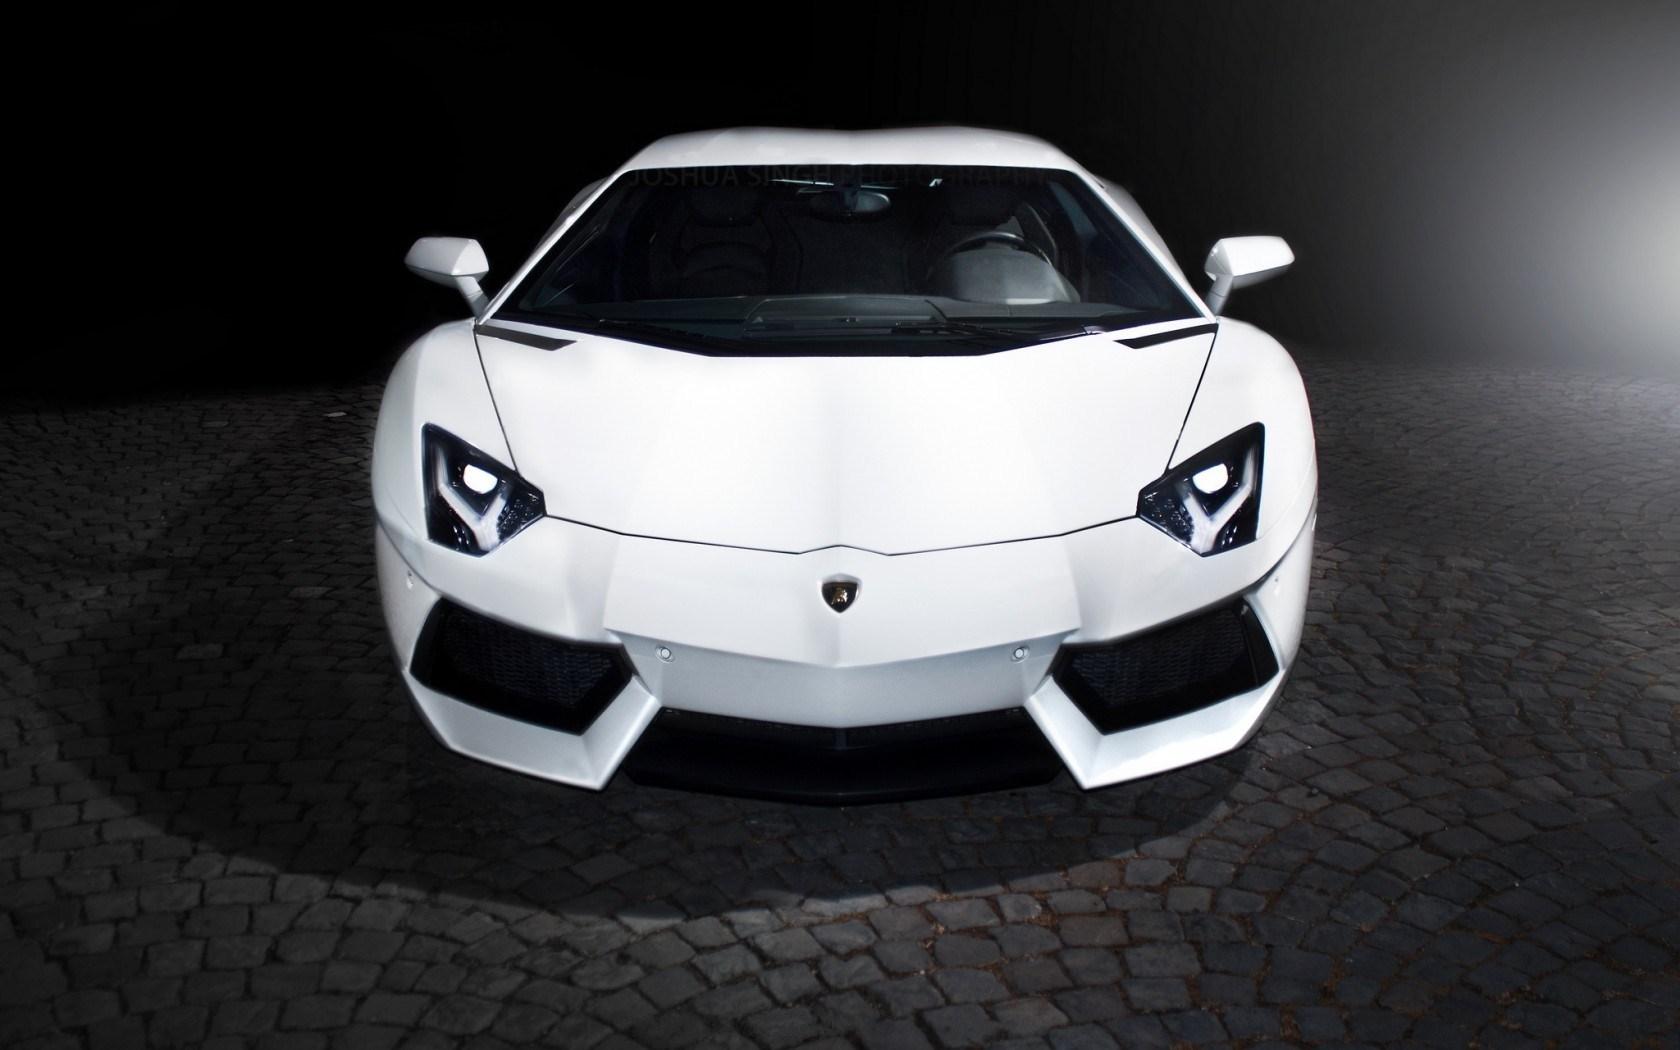 Lamborghini Aventador LP700-4 Front Car